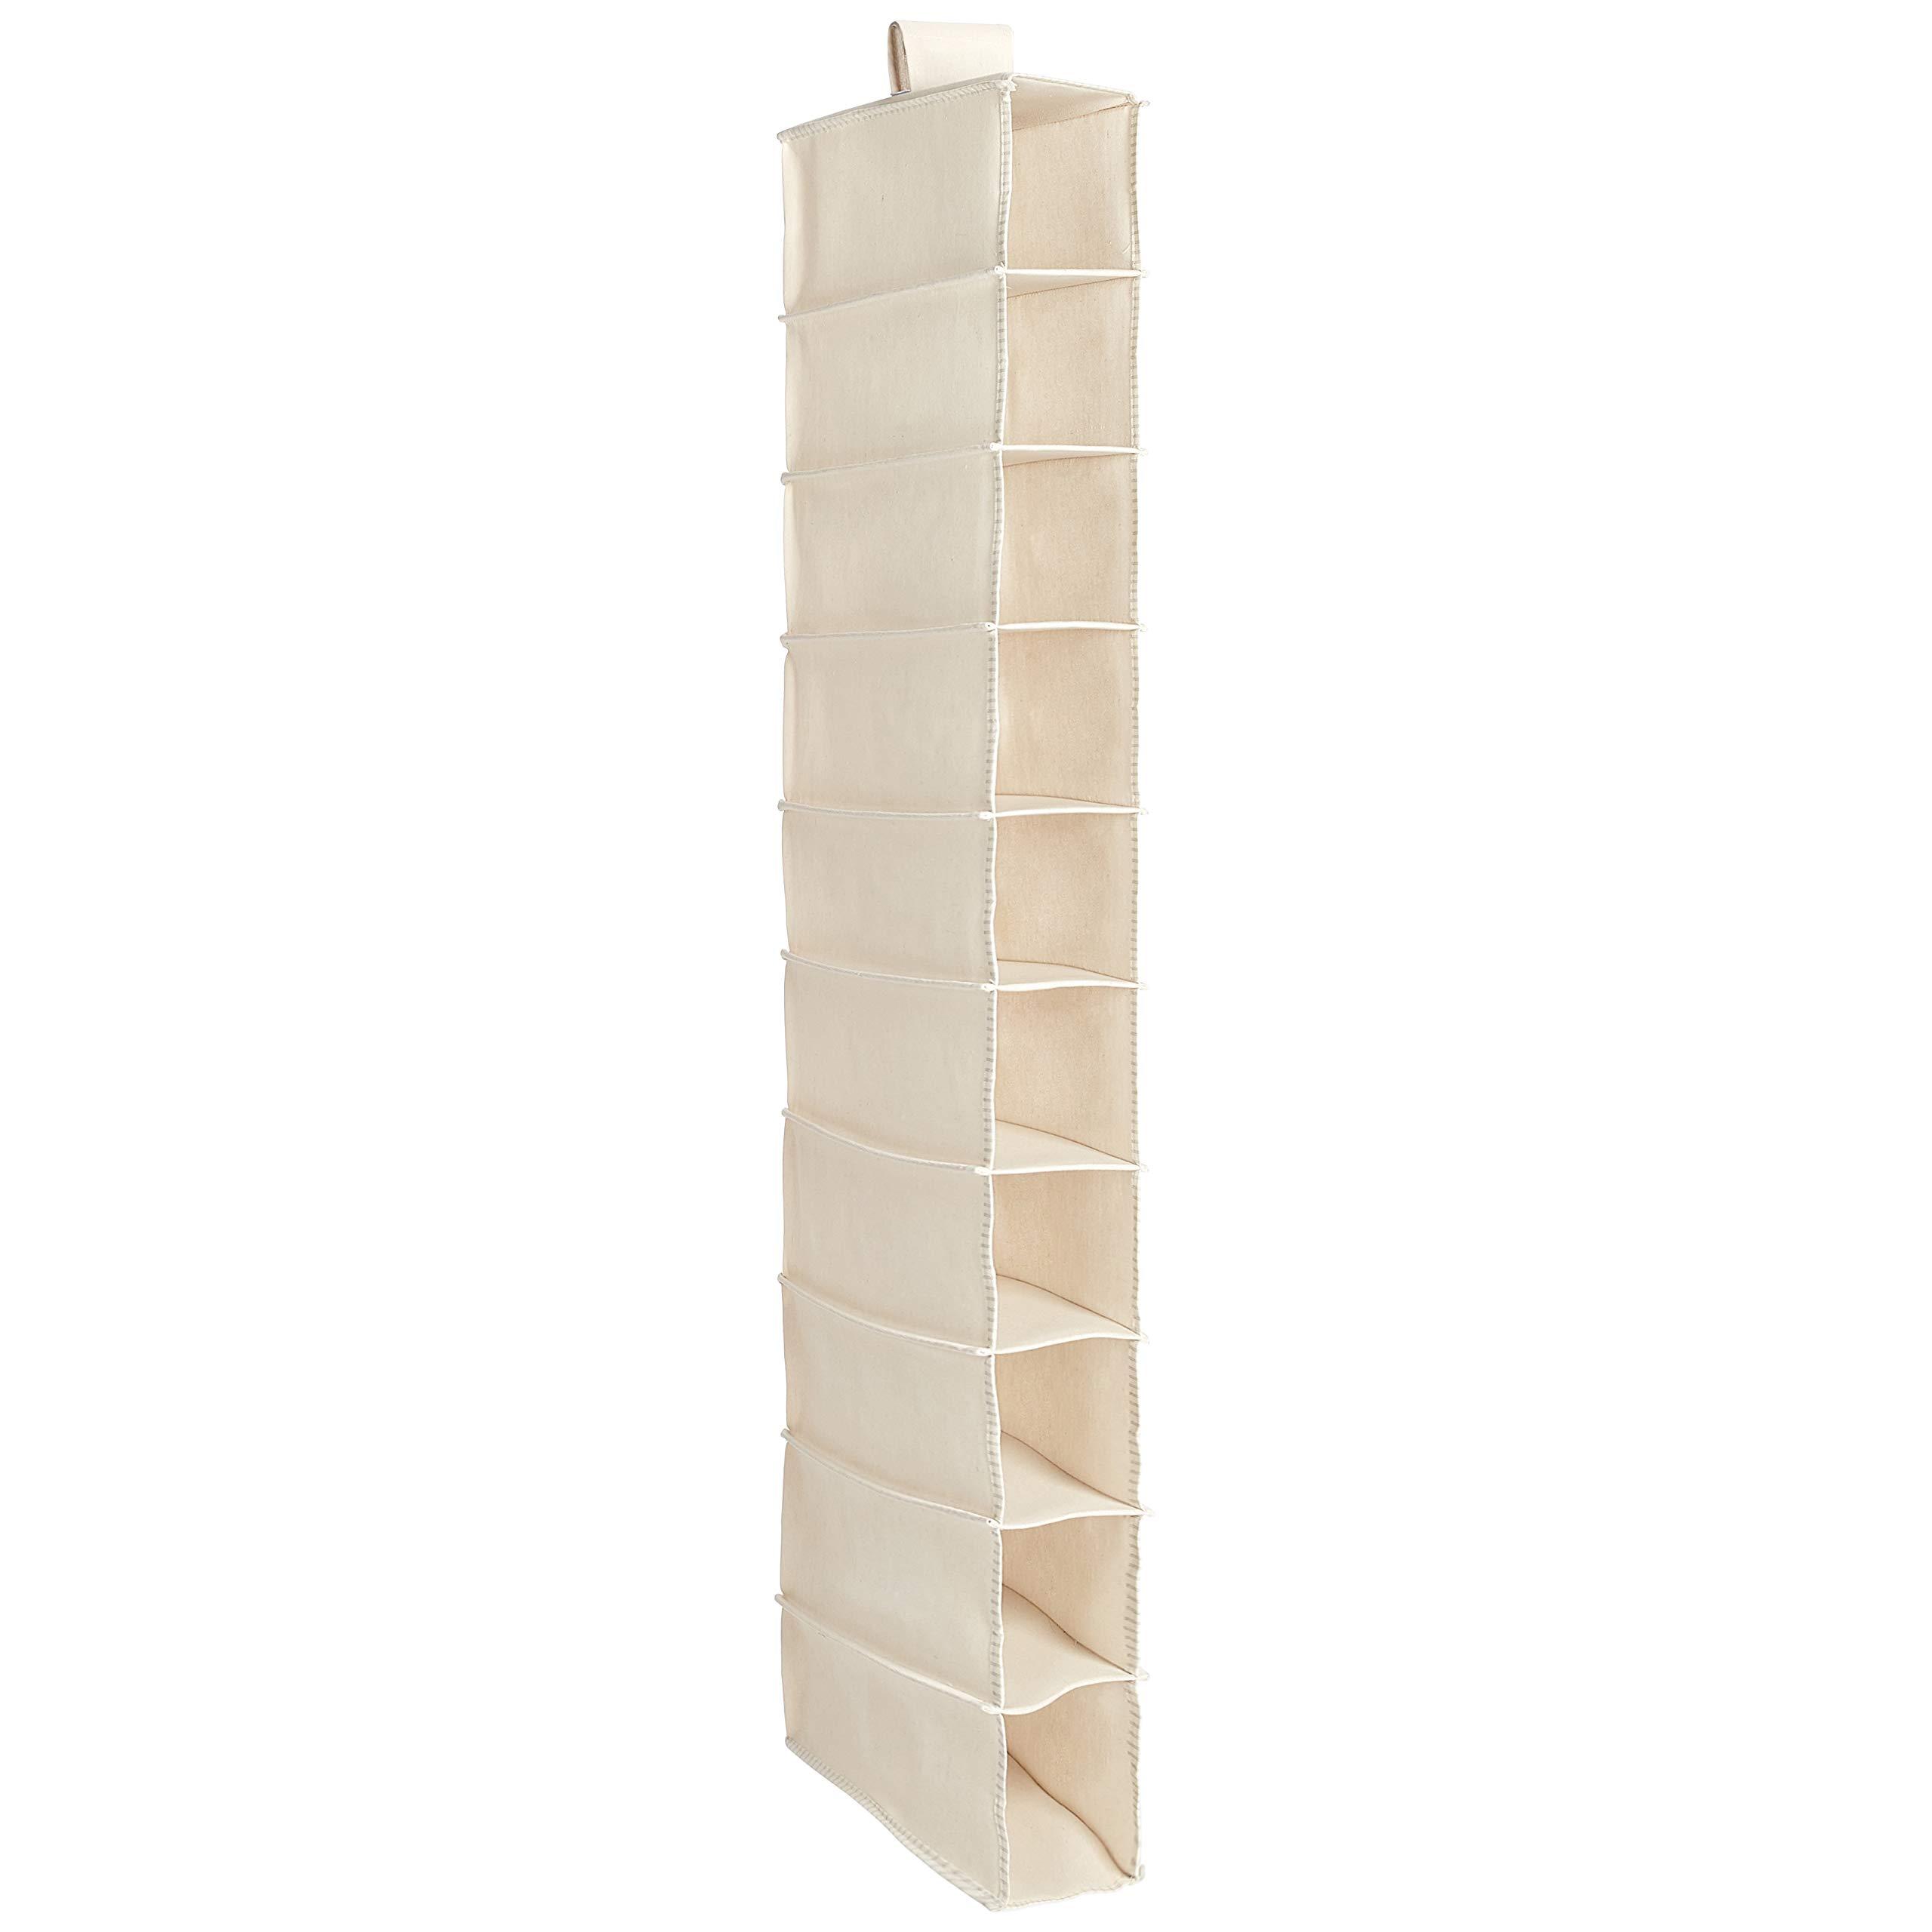 AmazonBasics Hanging Closet Shelf - 10-Tier, Canvas